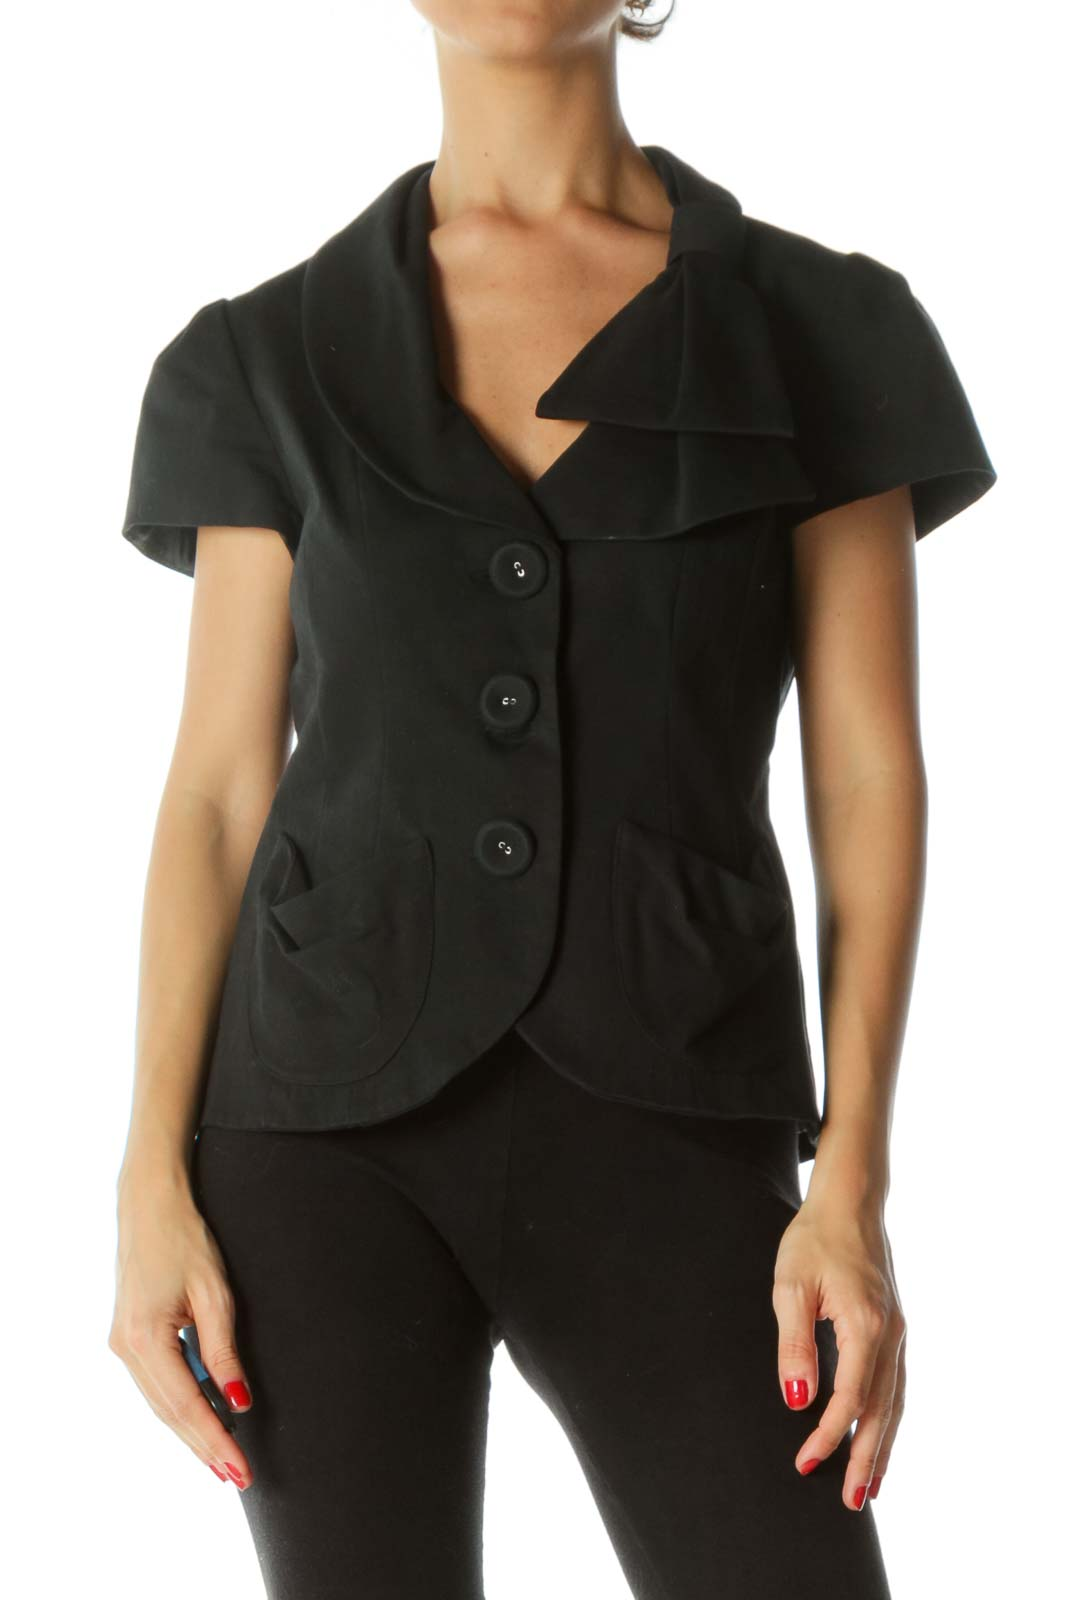 Black V-Neck Fabric-Buttons Bow-Shoulder Detail Textured Short-Sleeve Blazer Front